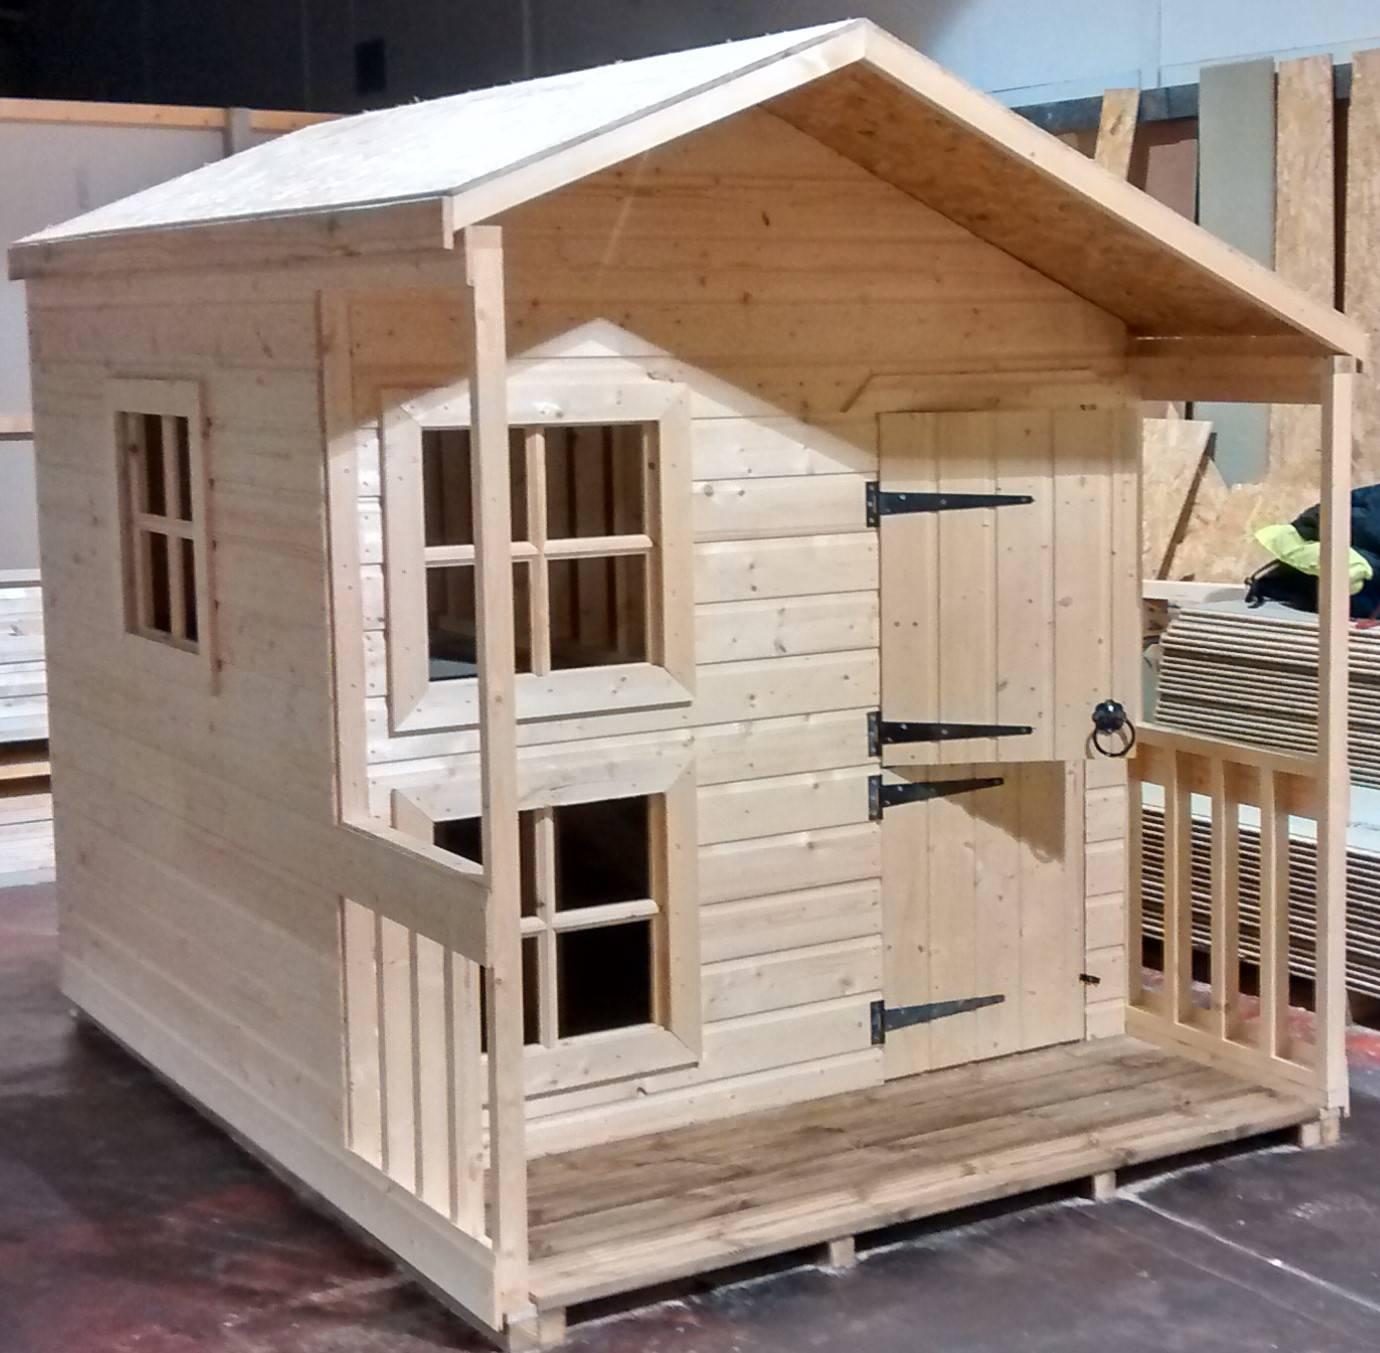 Two Storey Playhouse with Veranda (8' x 6')